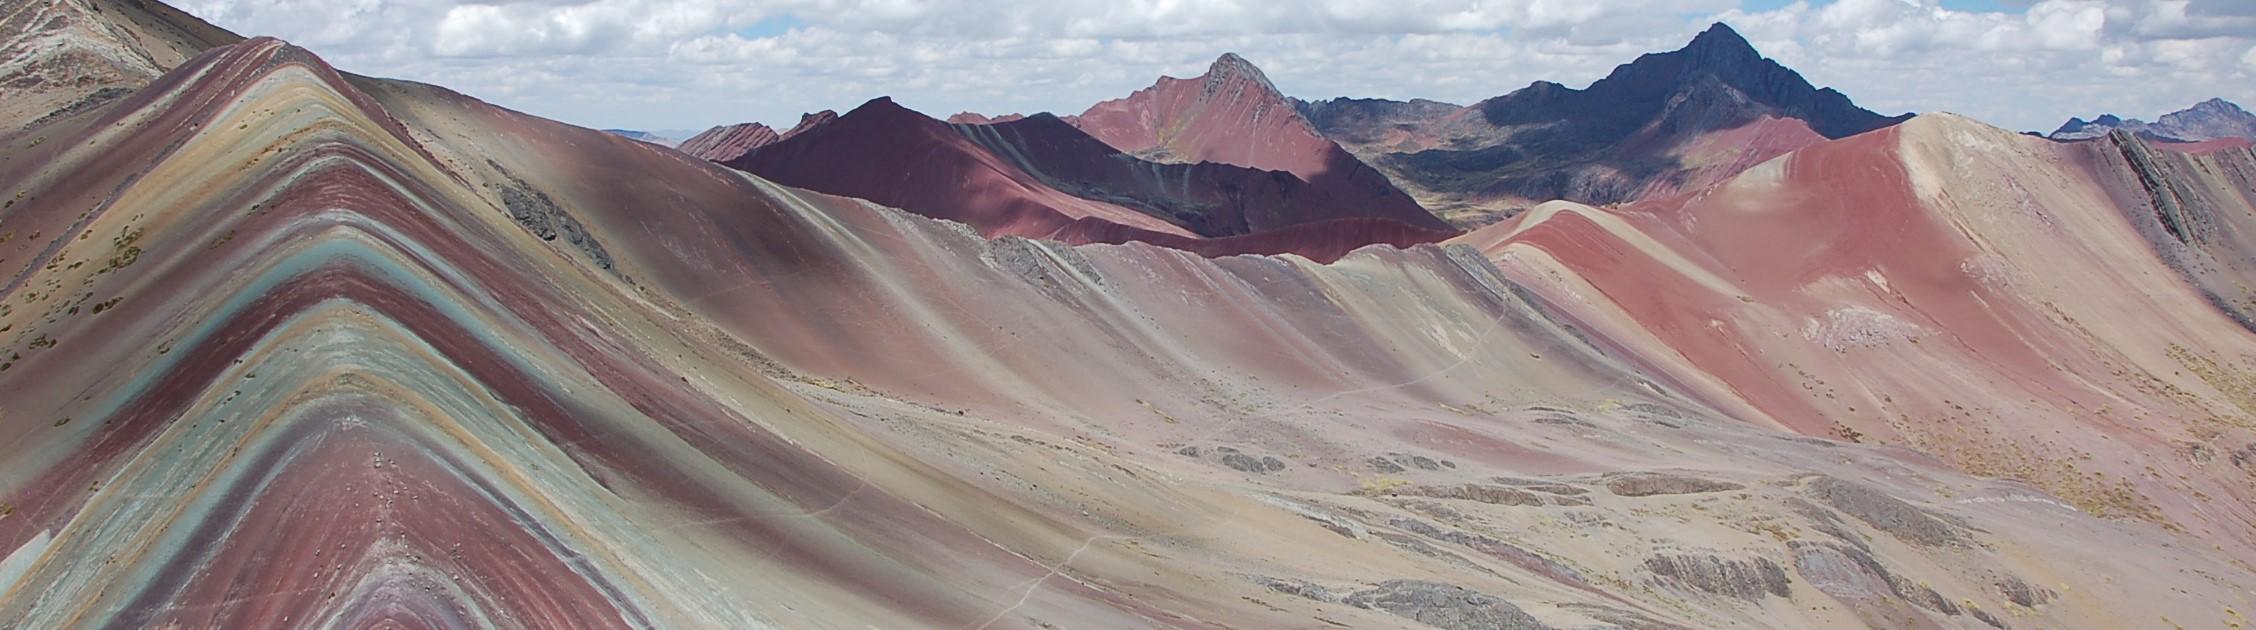 colouful mineral mountains, Ausangate Peru